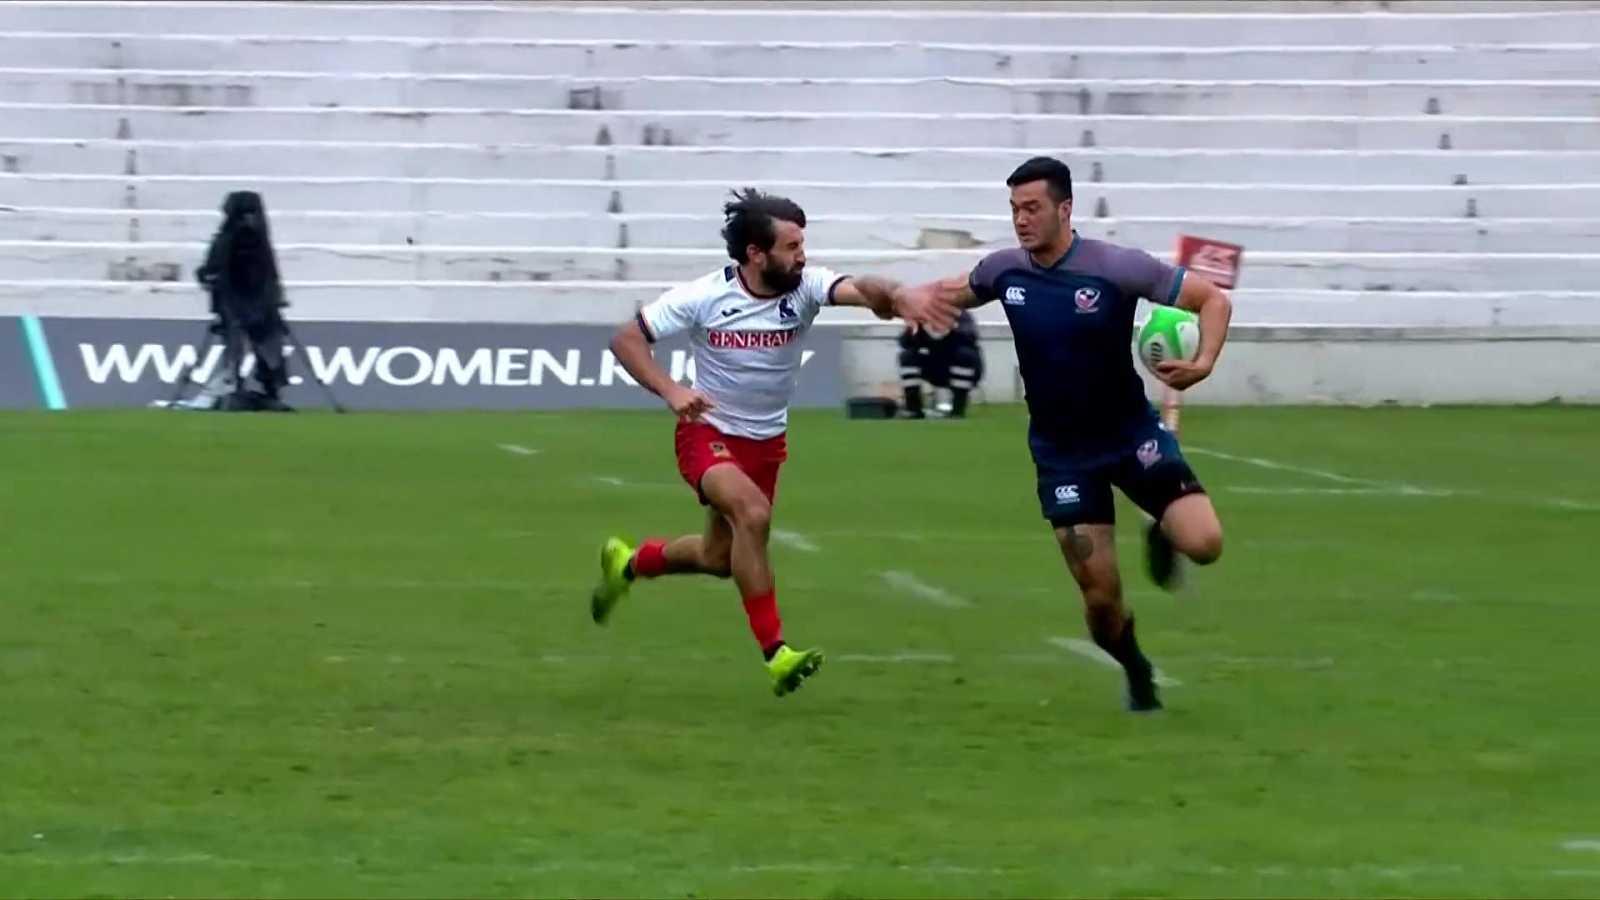 Rugby - Torneo internacional Sevens (masculino): USA - España - ver ahora